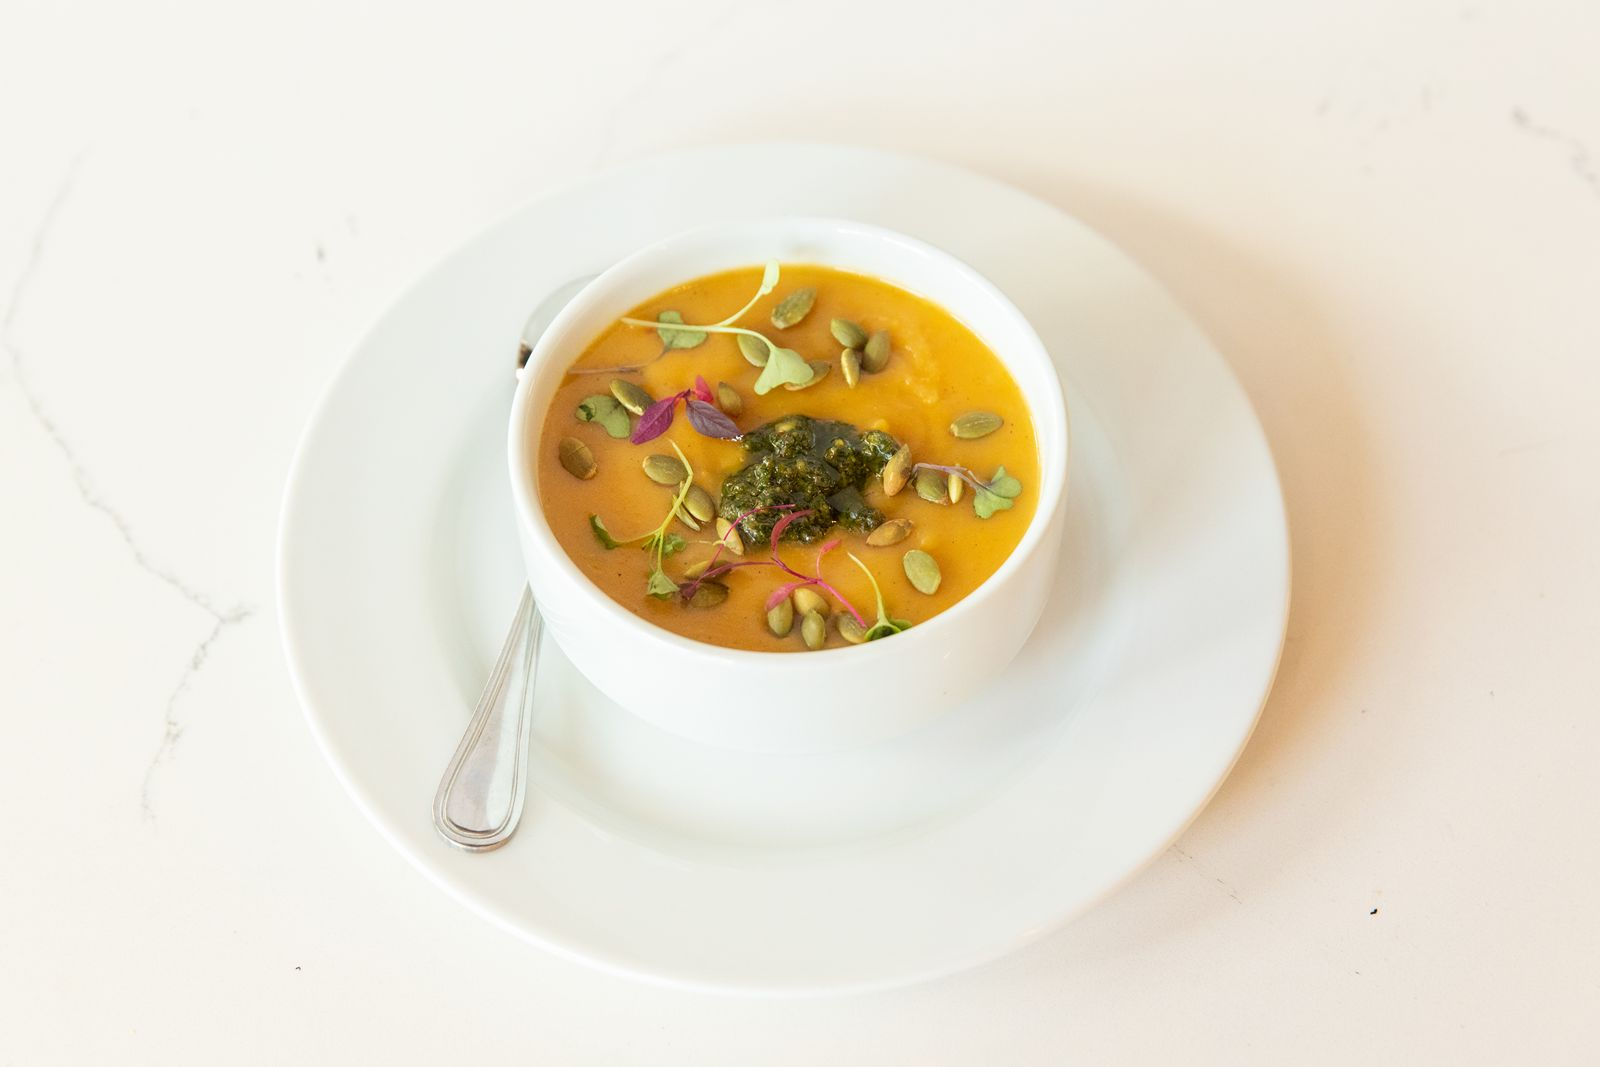 bellagreen Butternut Squash & Pesto Soup